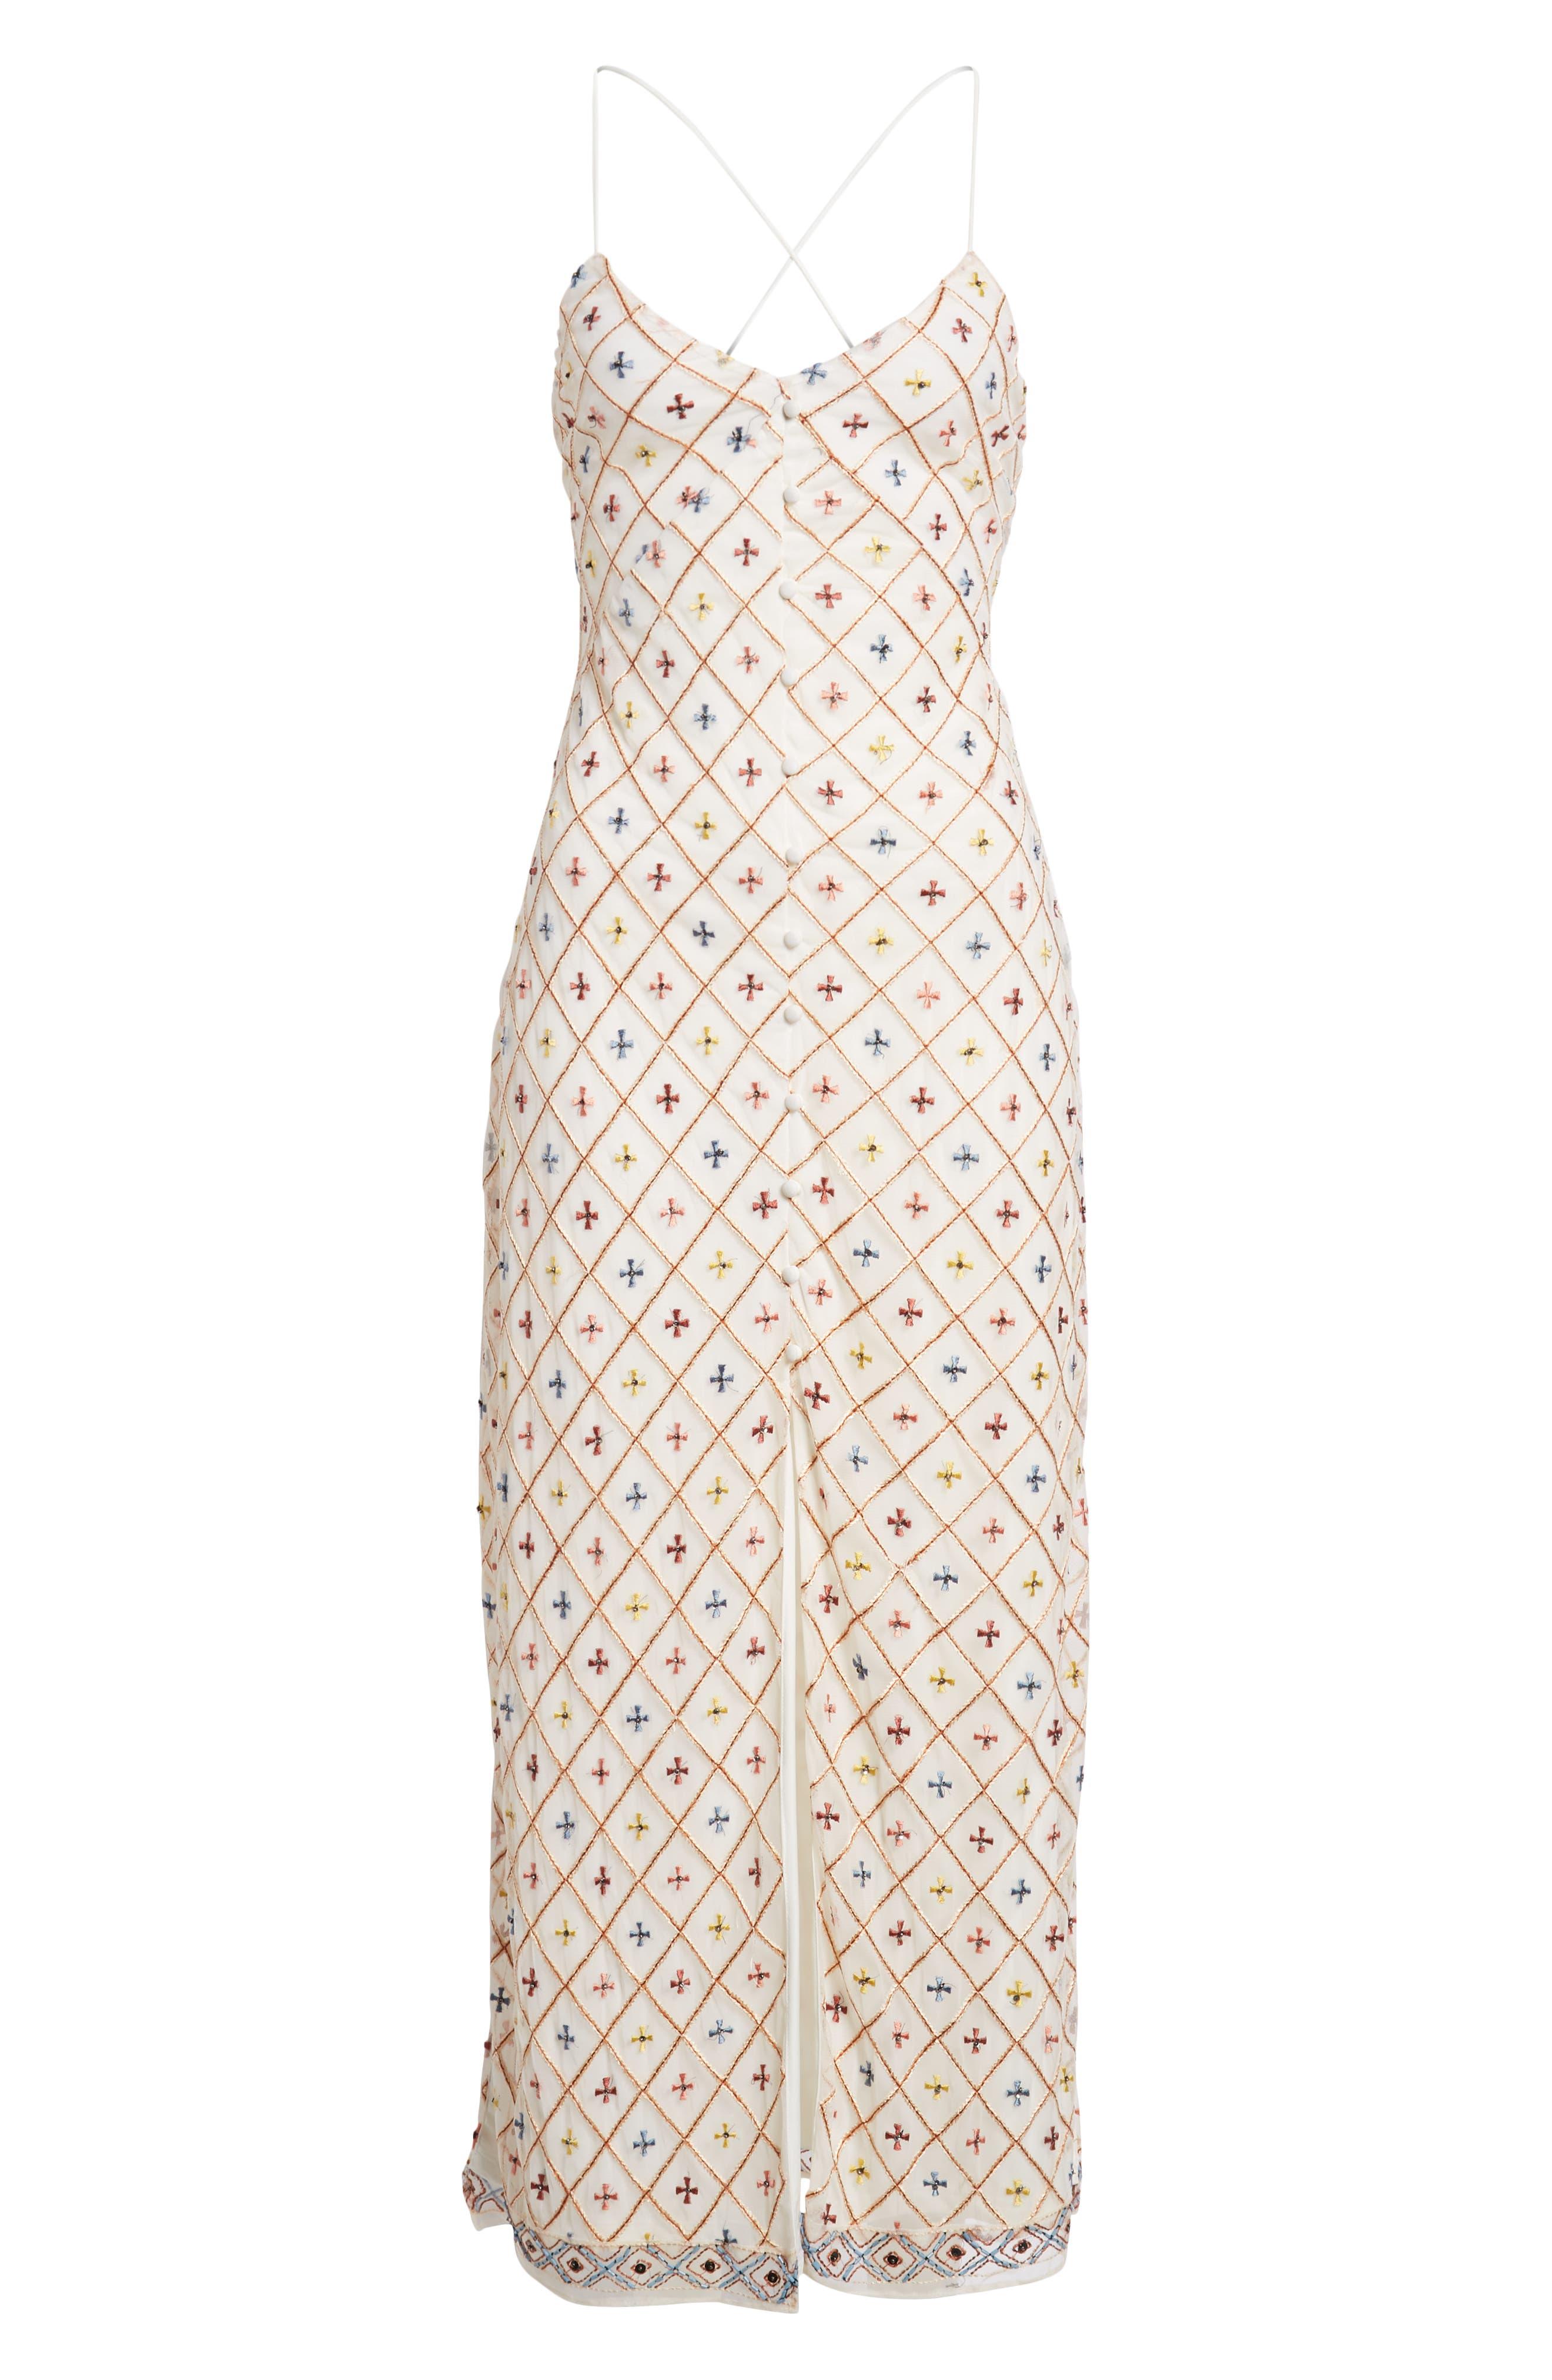 Linda Maxi Dress,                             Alternate thumbnail 7, color,                             Cream